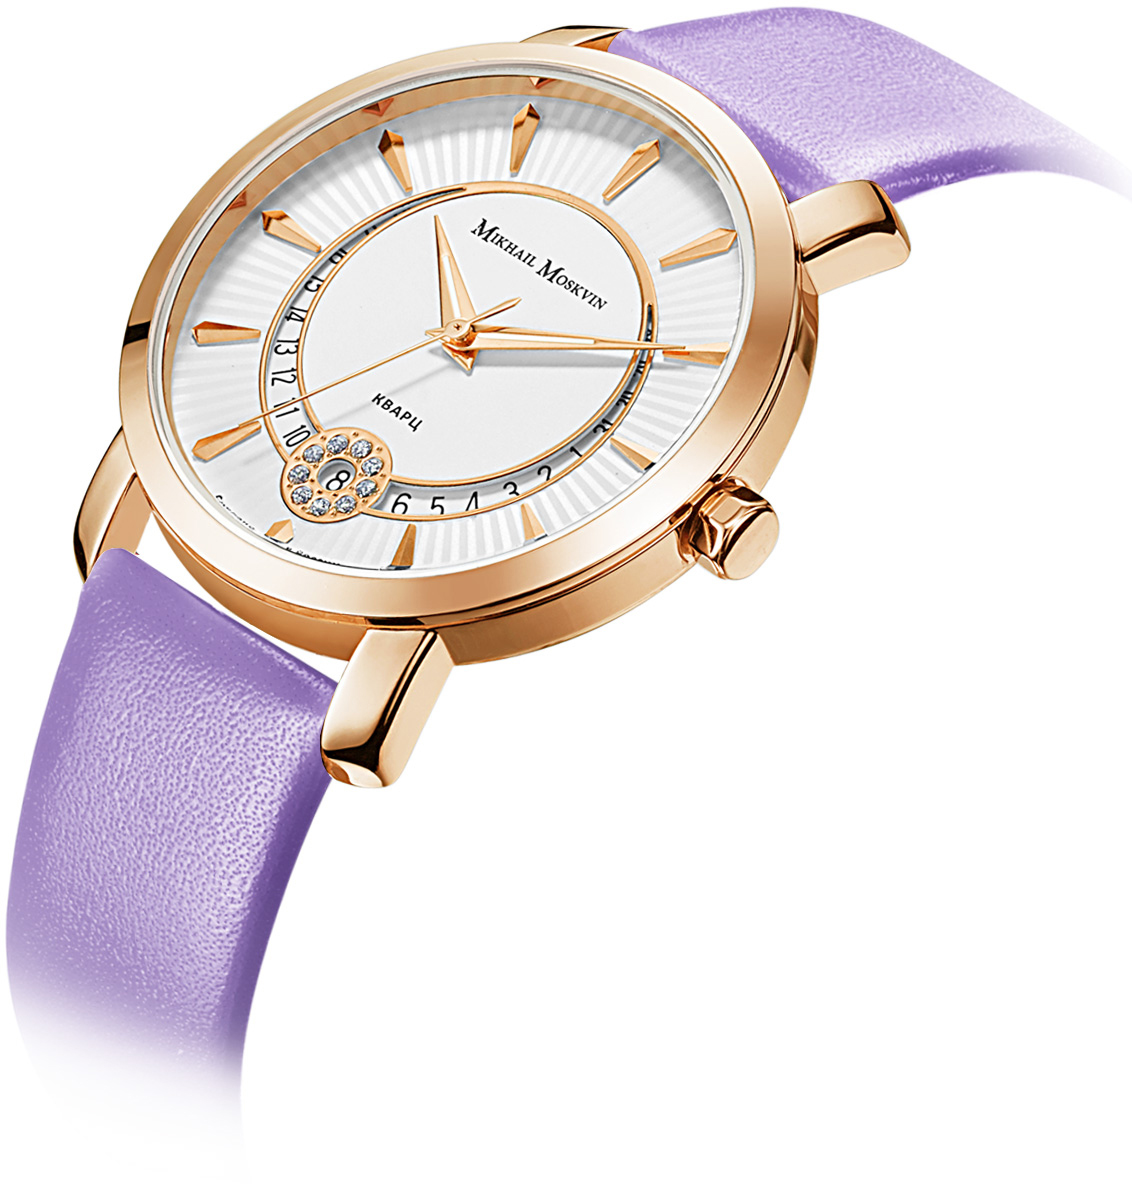 Часы наручные женские Mikhail Moskvin, цвет: золотистый, фиолетовый. 1253A3L2-12 Mikhail Moskvin